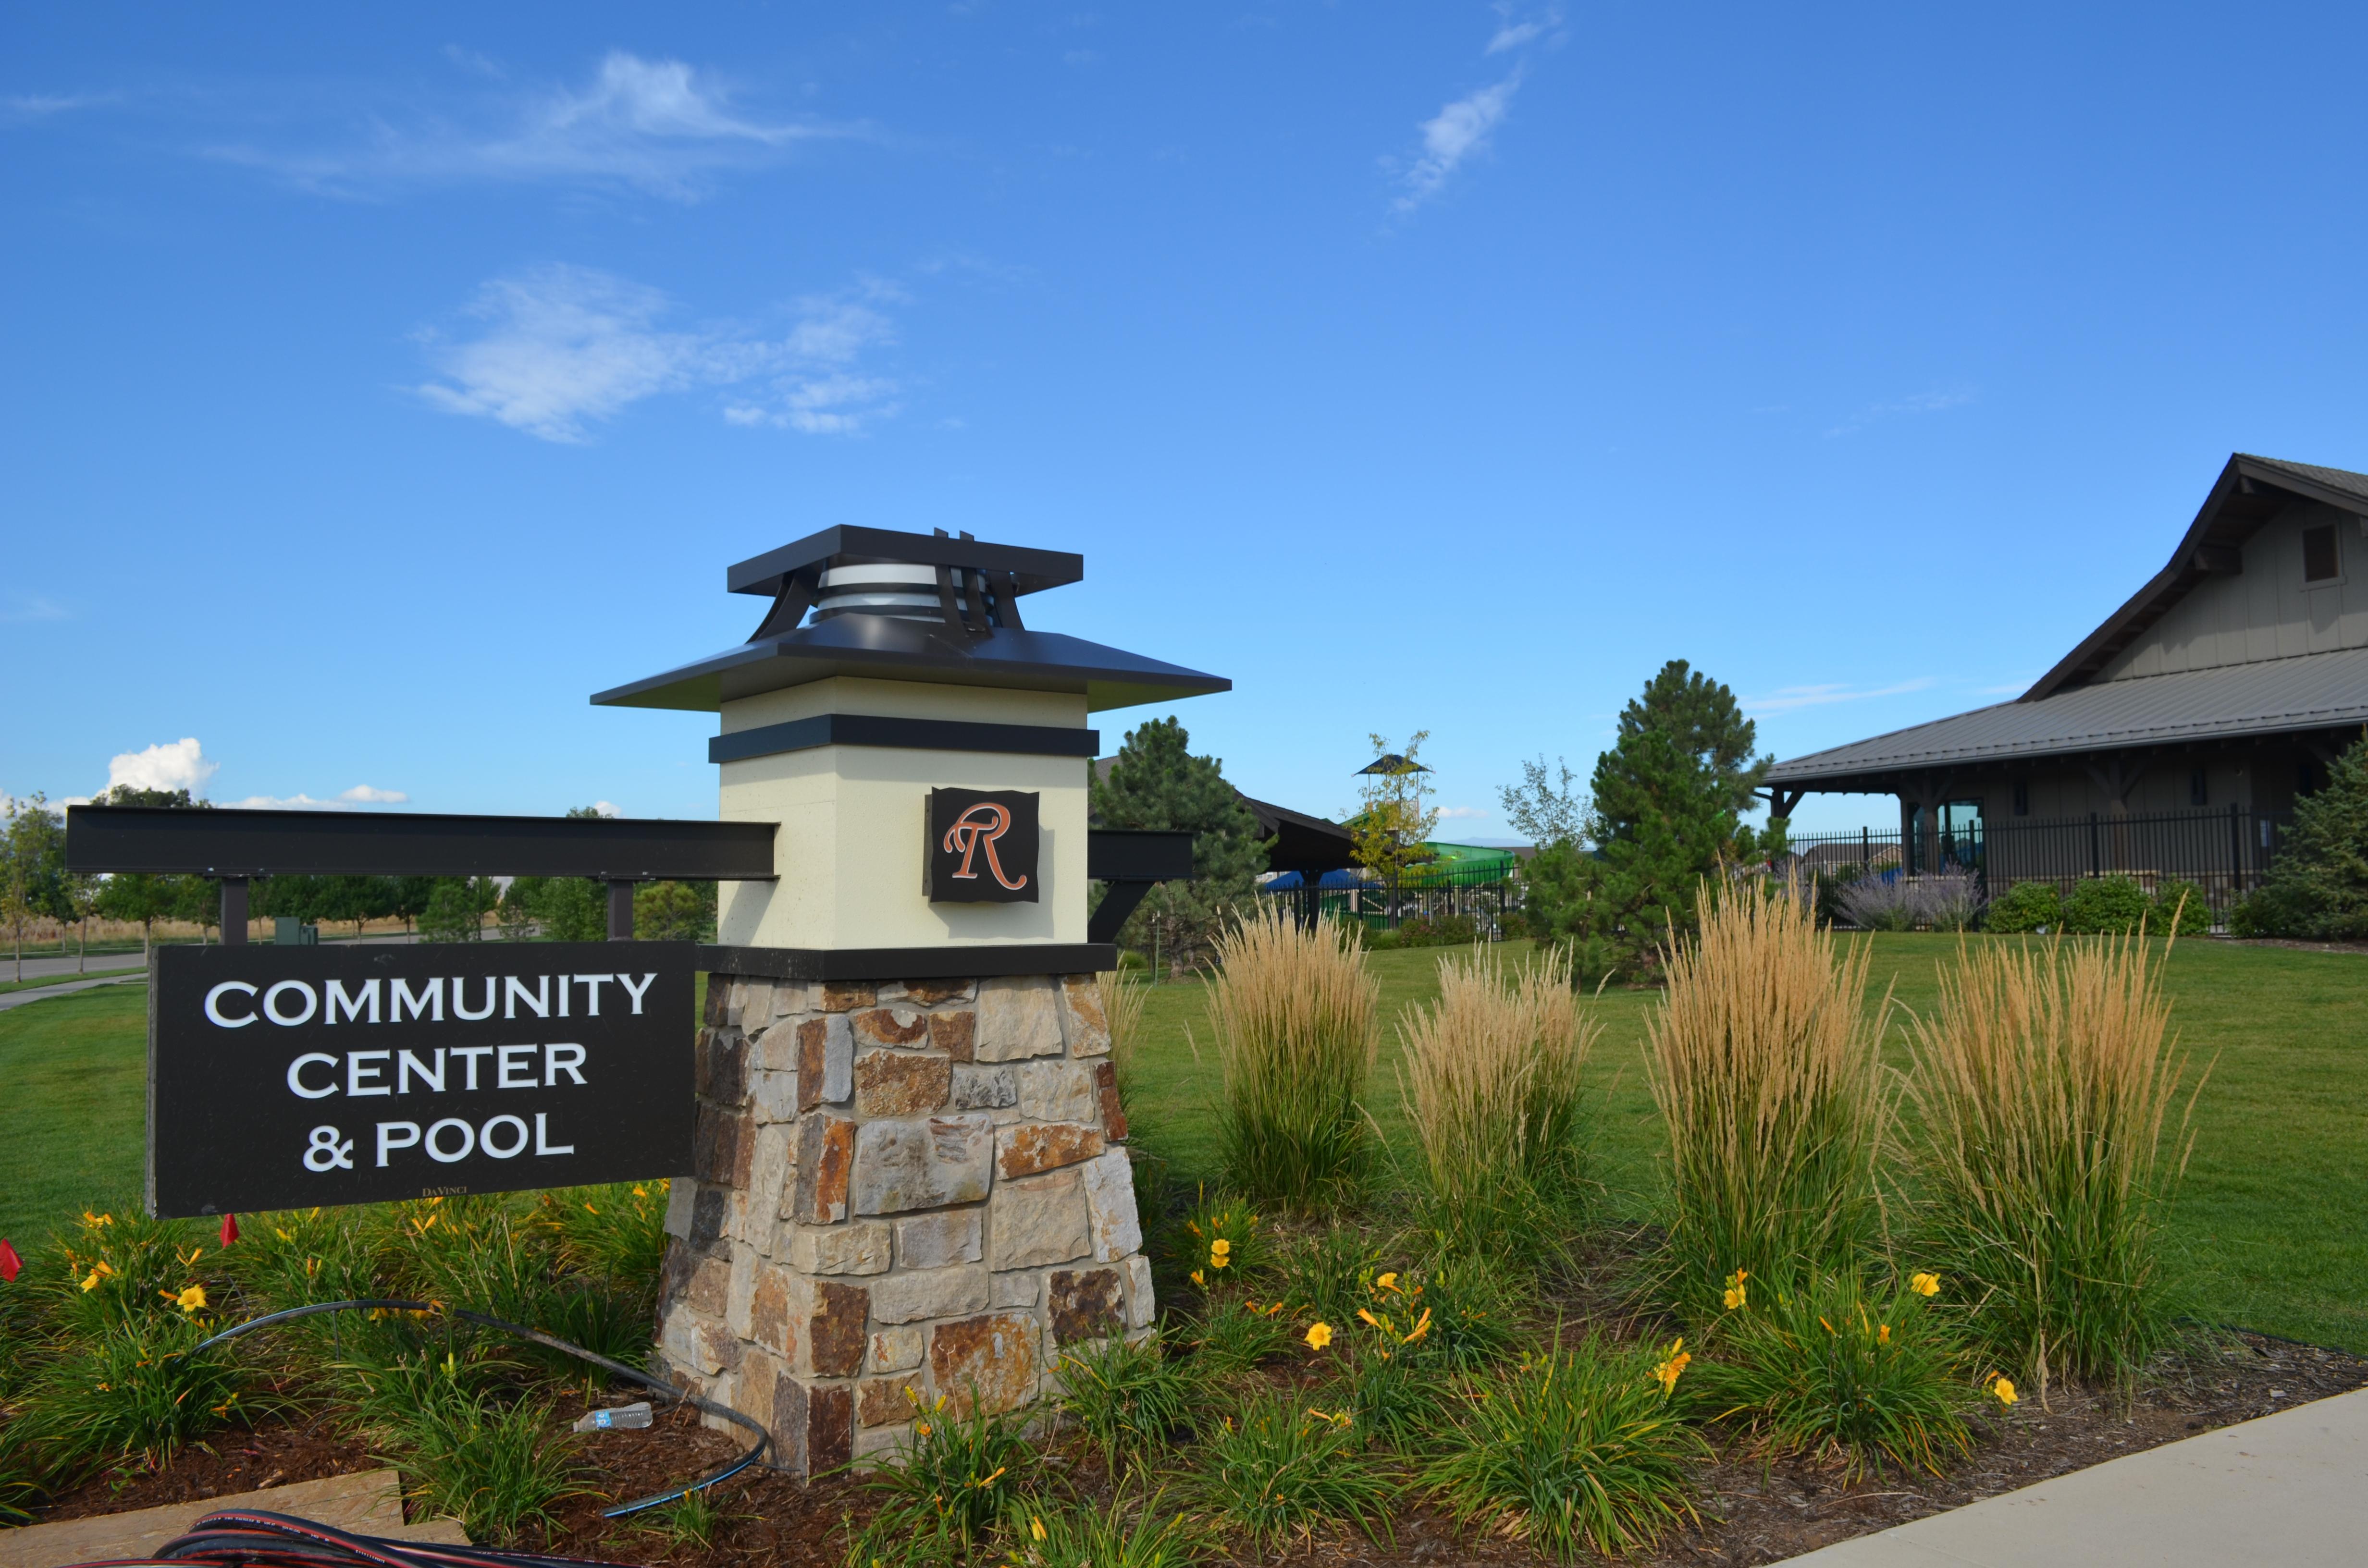 Community Center sign